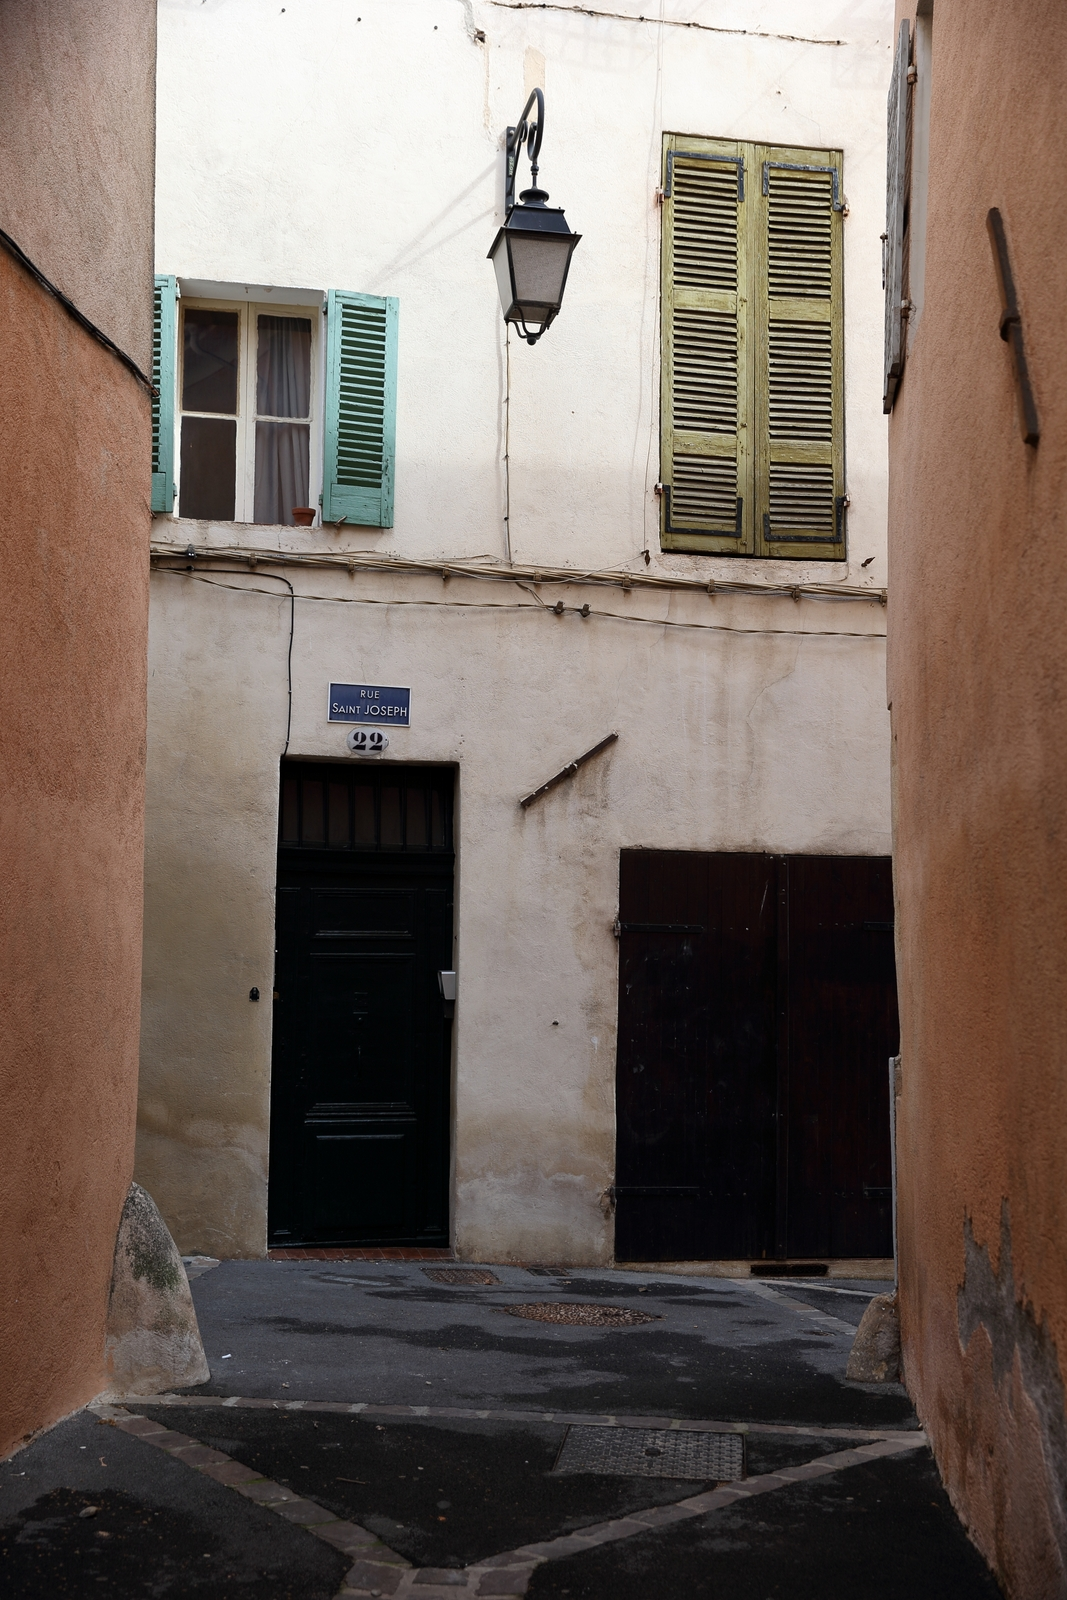 rue Saint Joseph